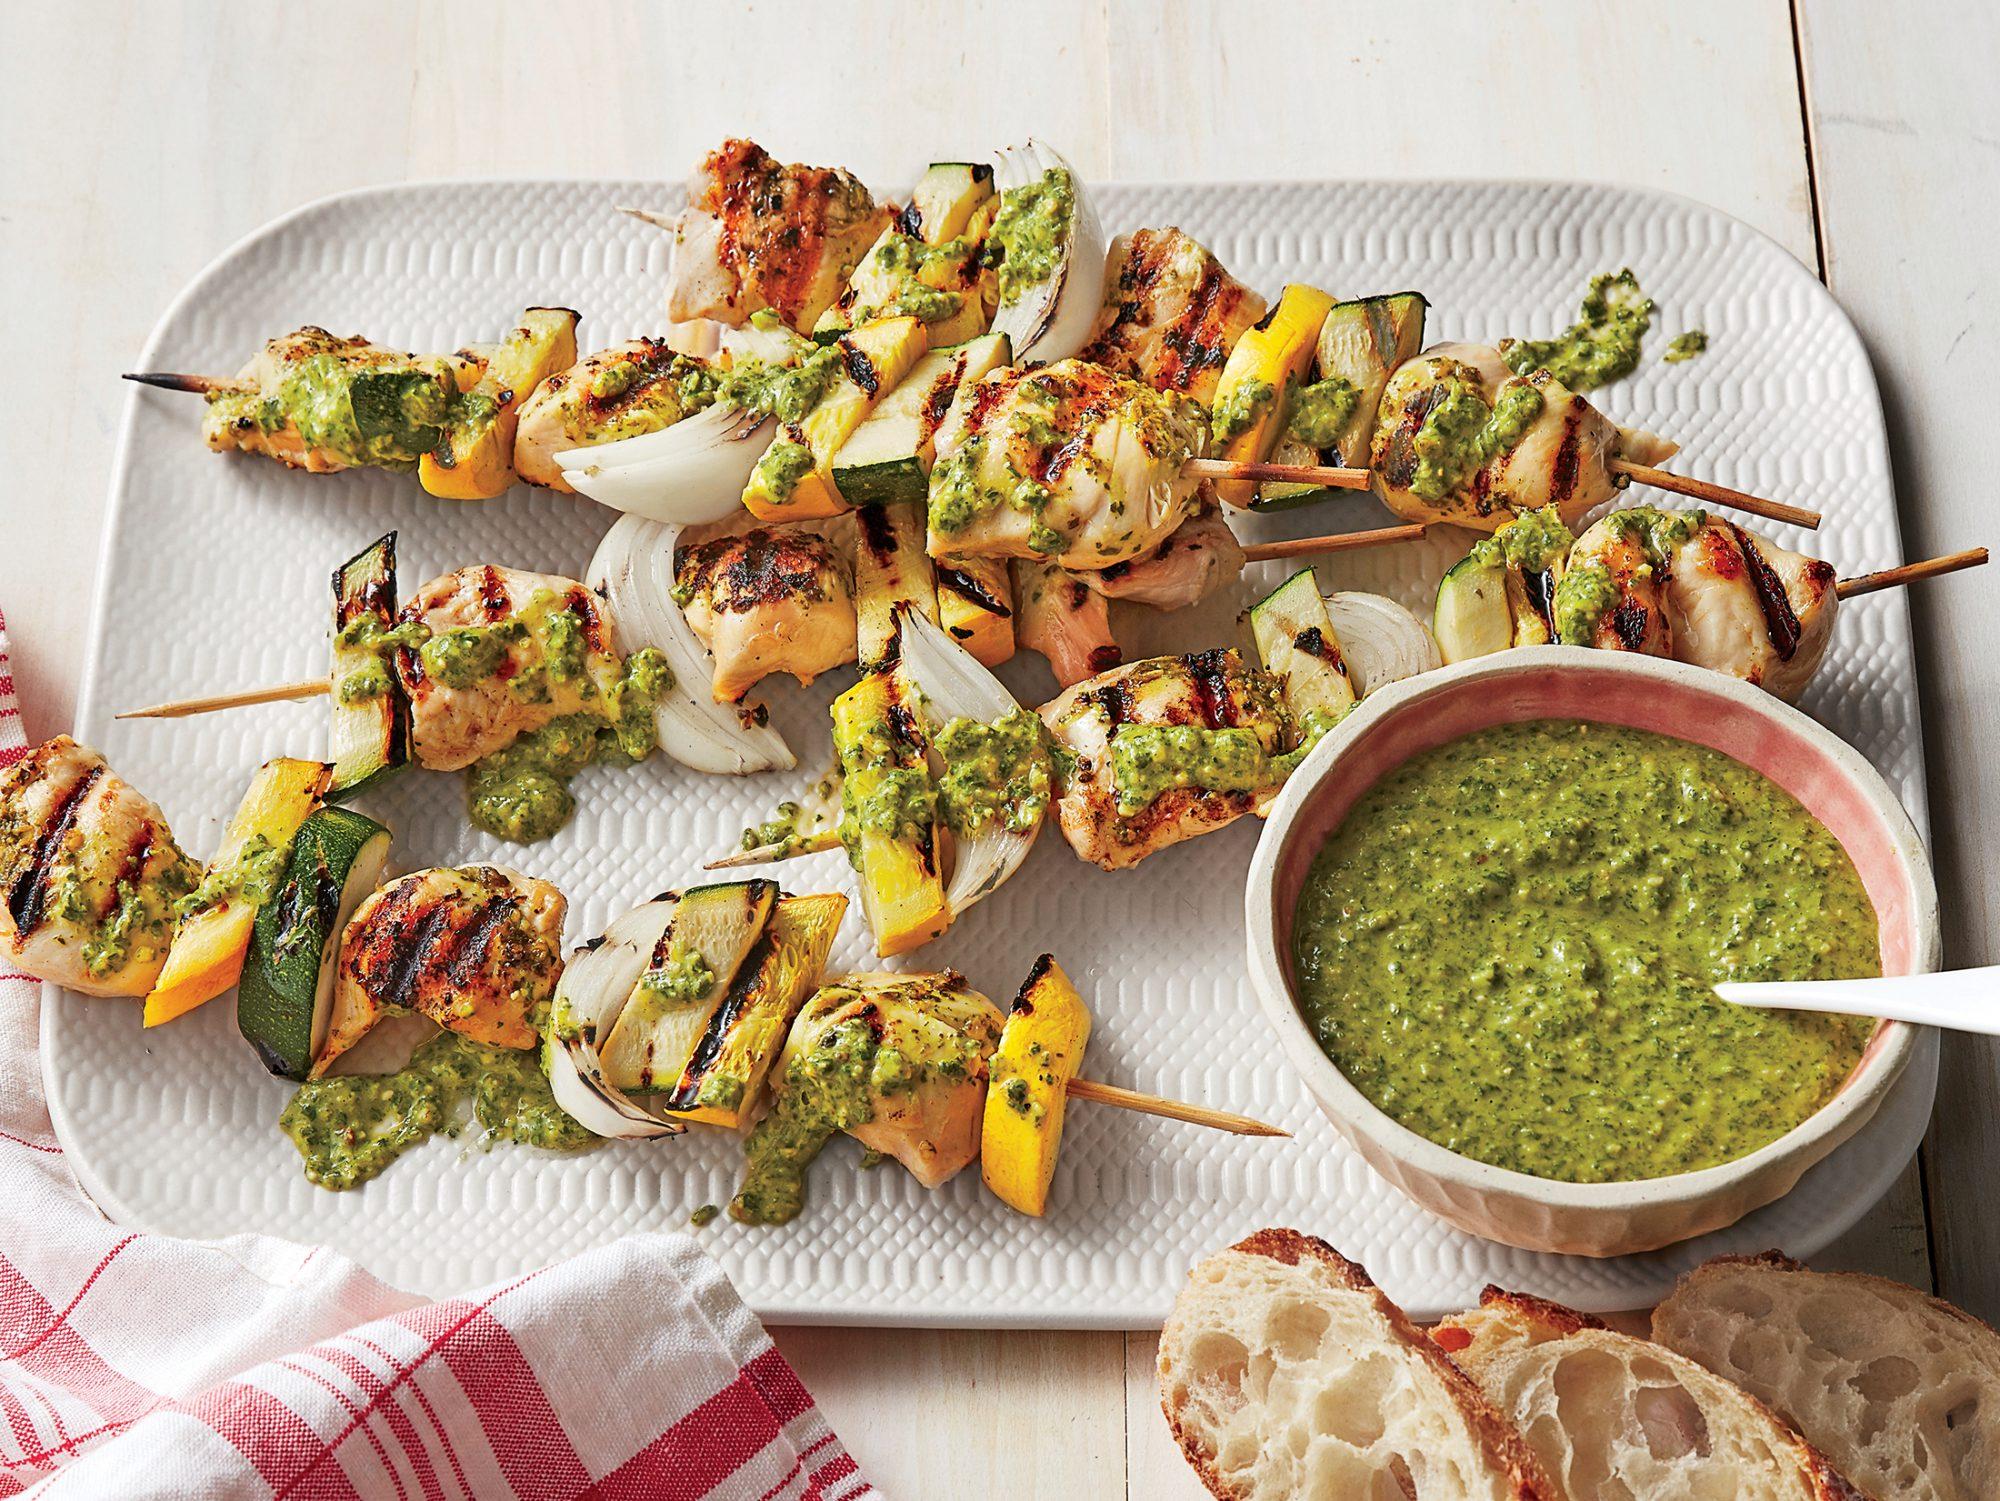 sl-Grilled Chicken Kebabs with Arugula Pesto